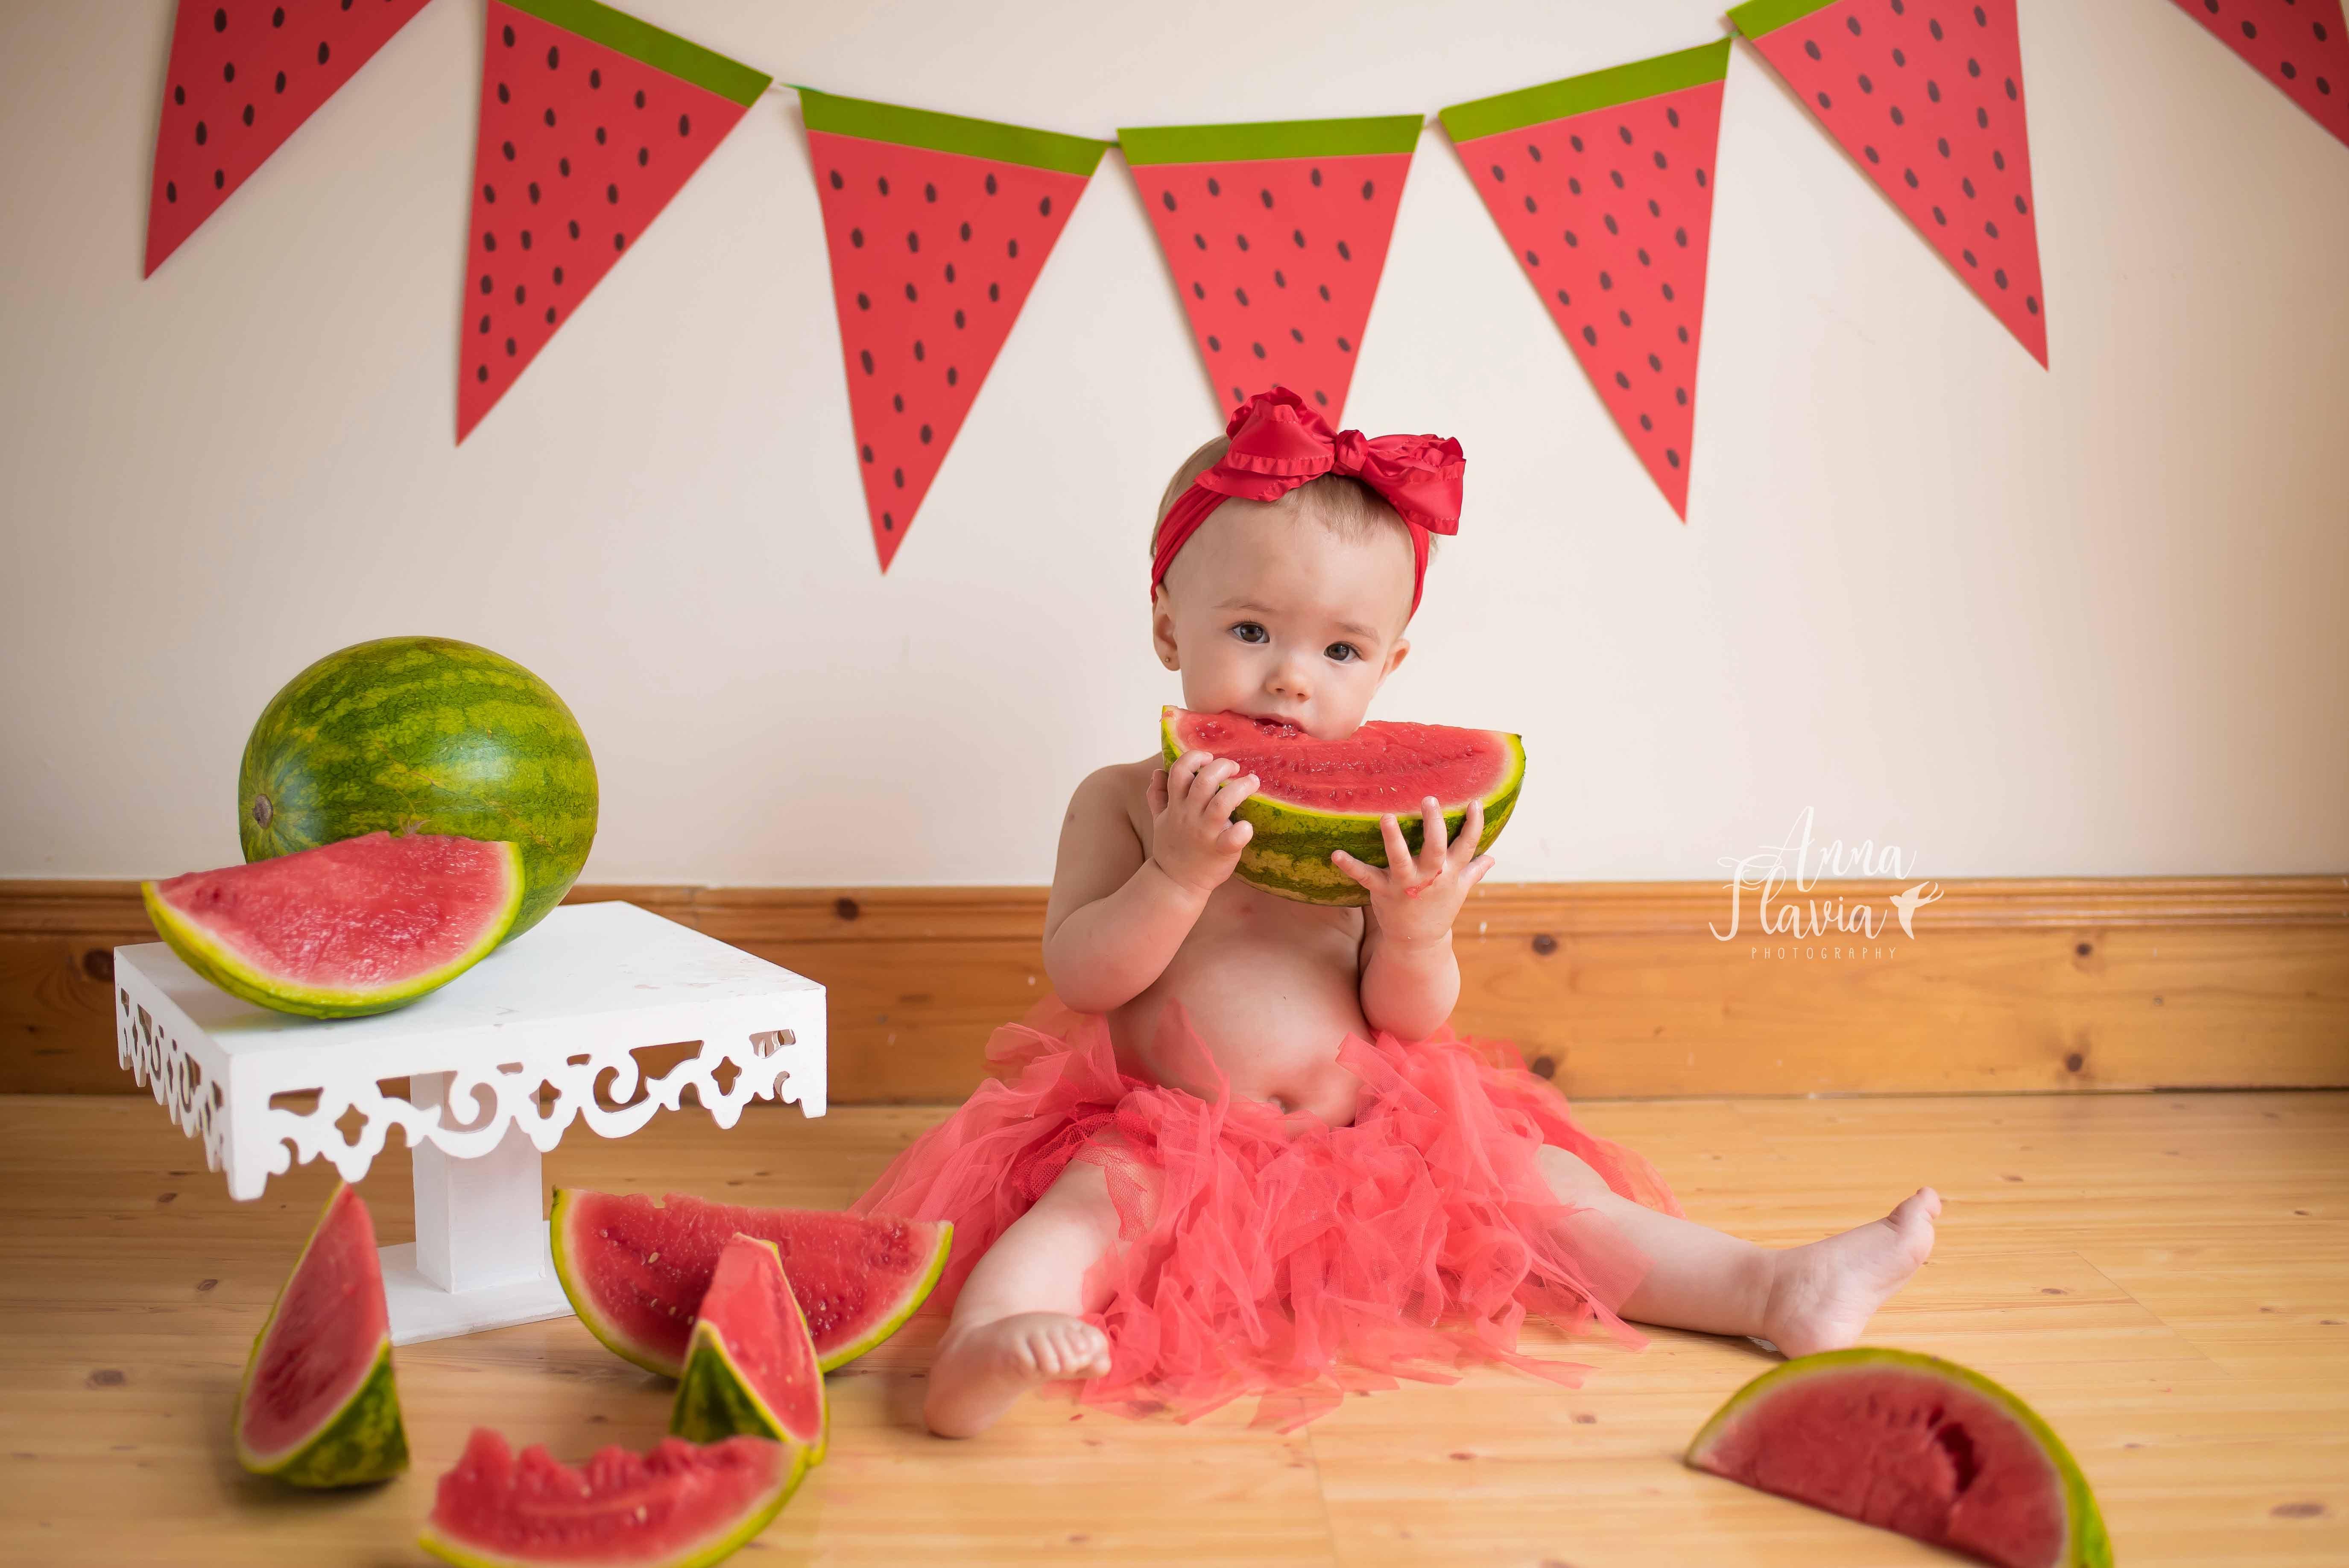 photographer_dublin_anna_flavia_children_baby_newborn_family_19